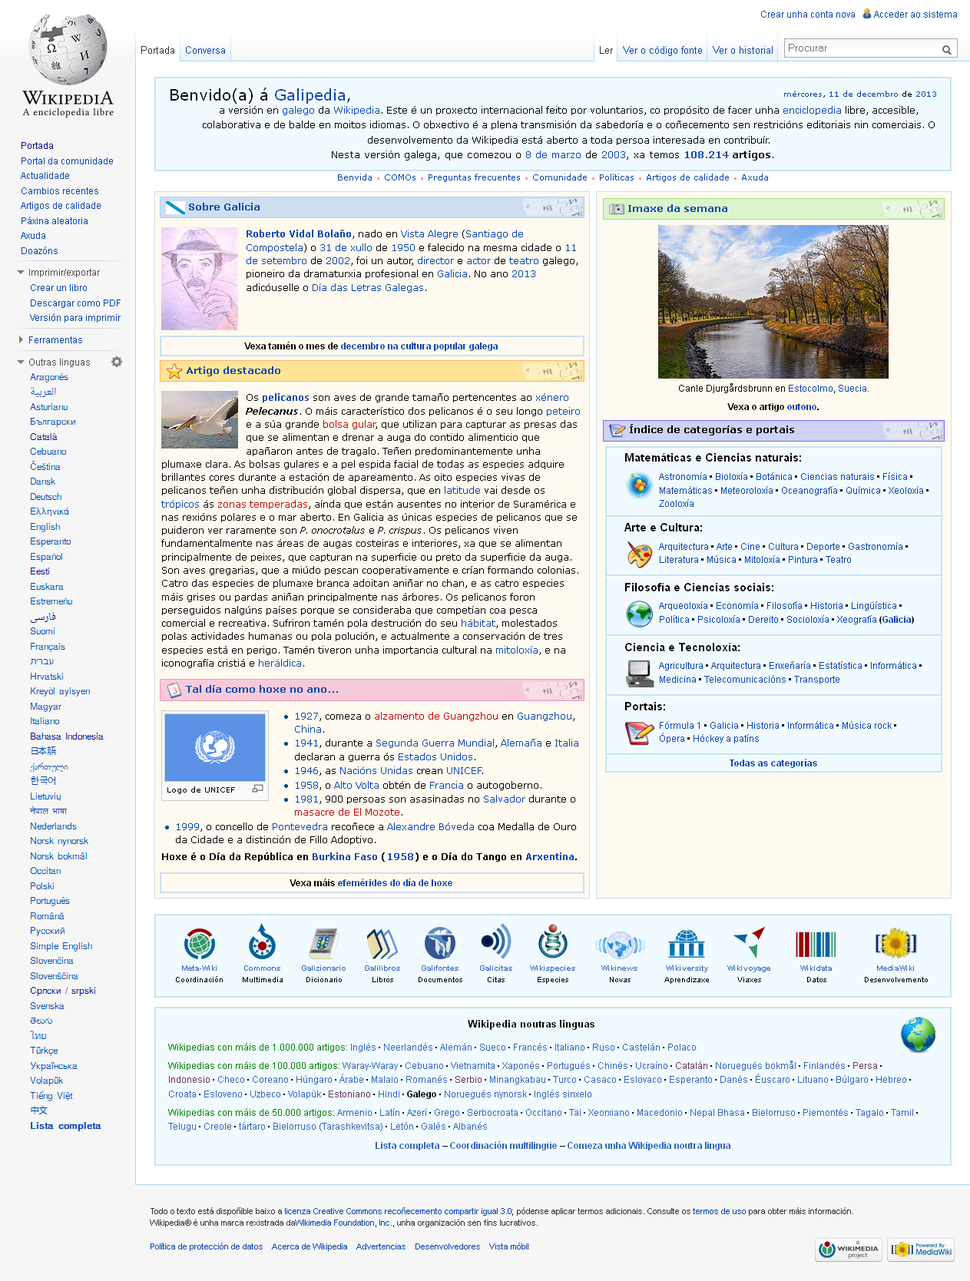 Galician wiki 20131211